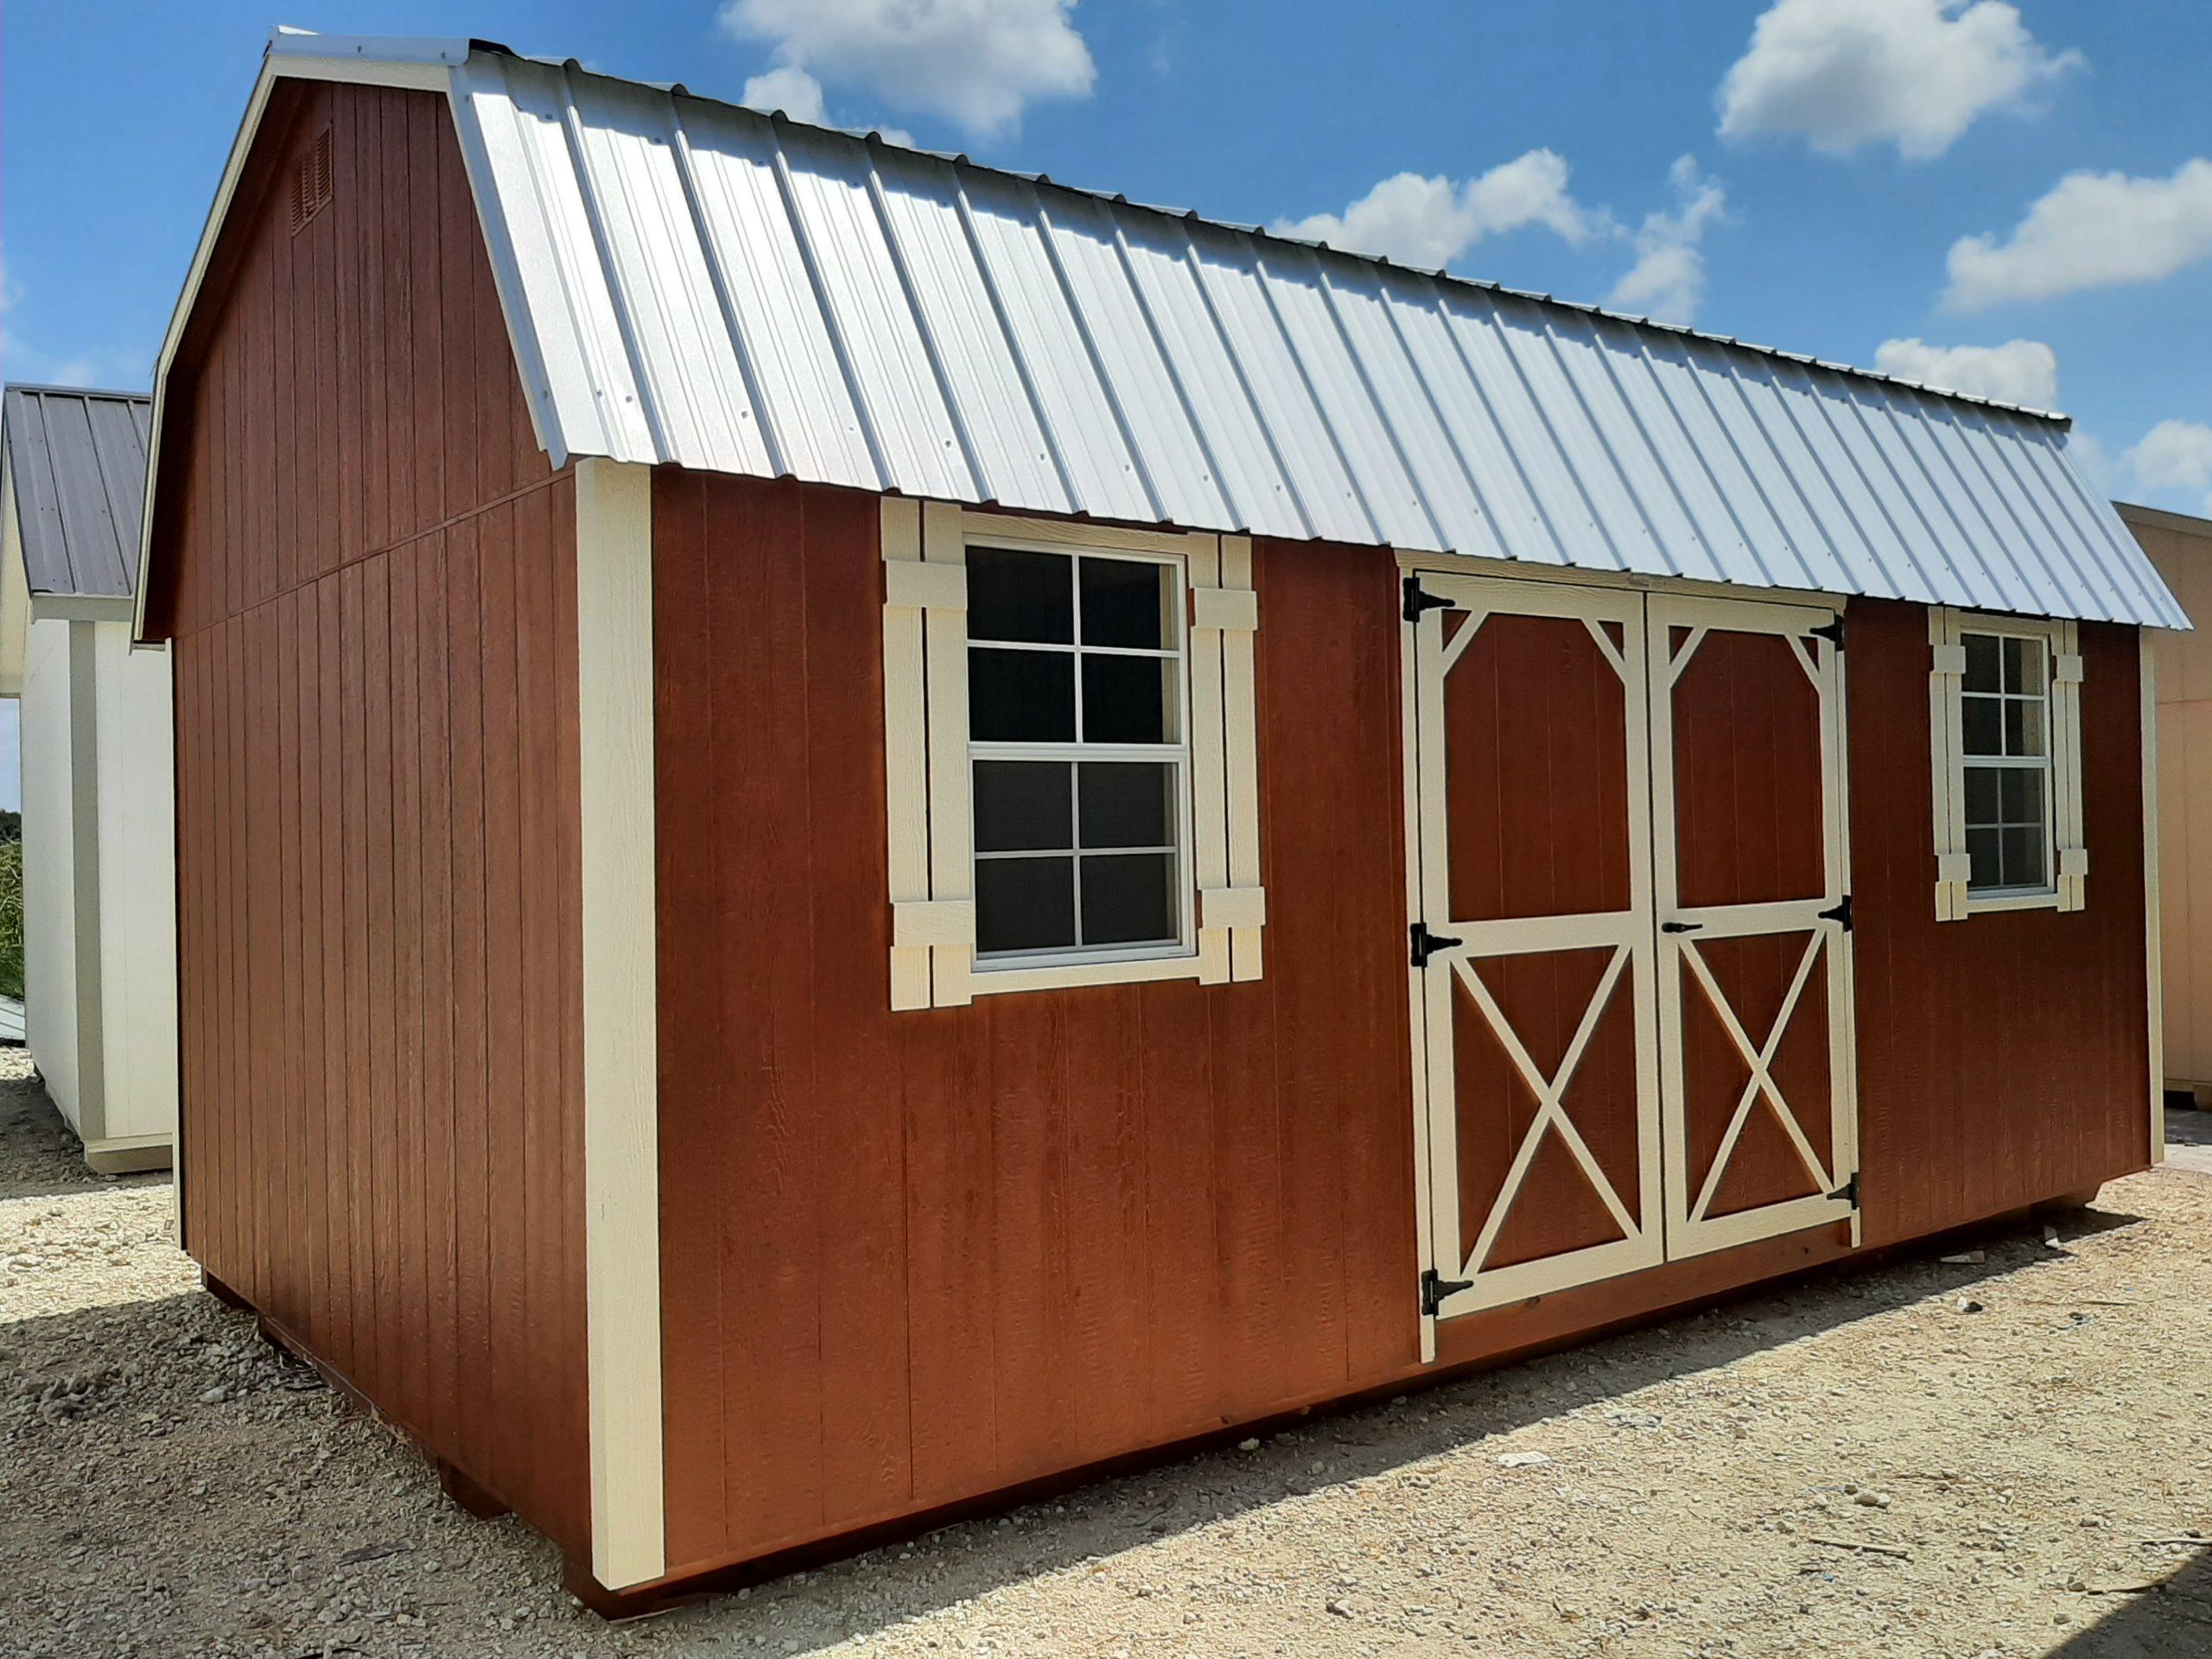 12x20 Elite Lofted Barn #2261 Image